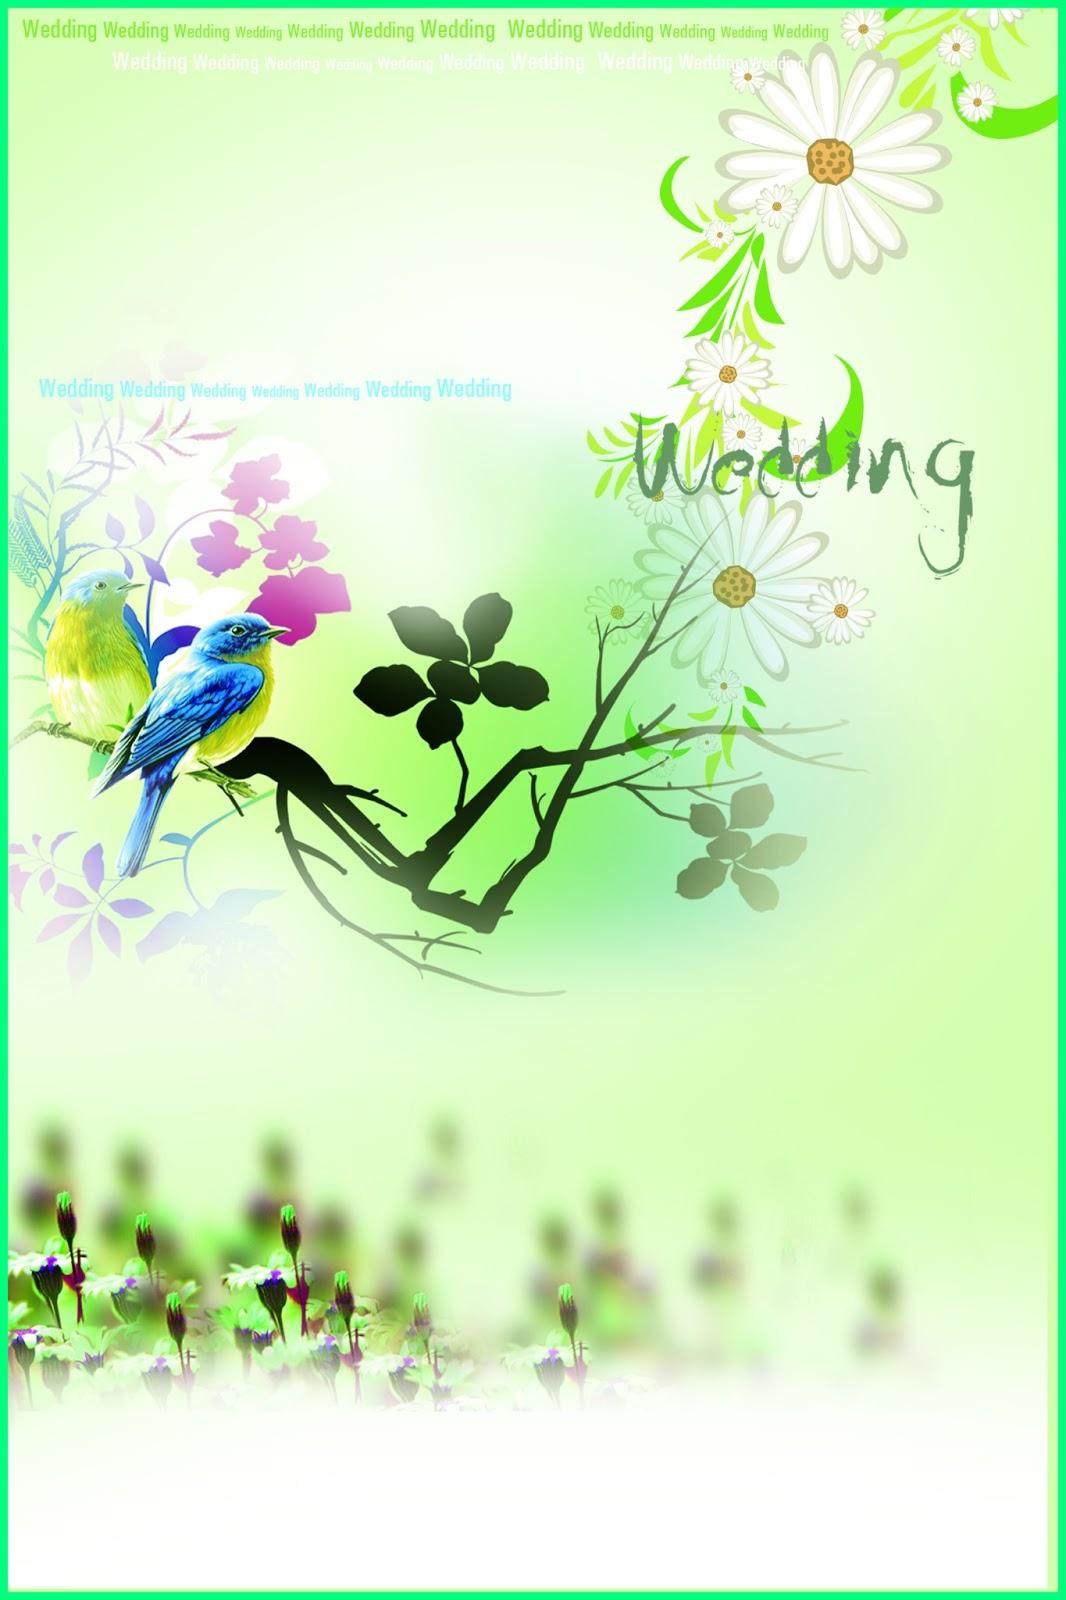 wedding backgrounds  abdonlinemedia